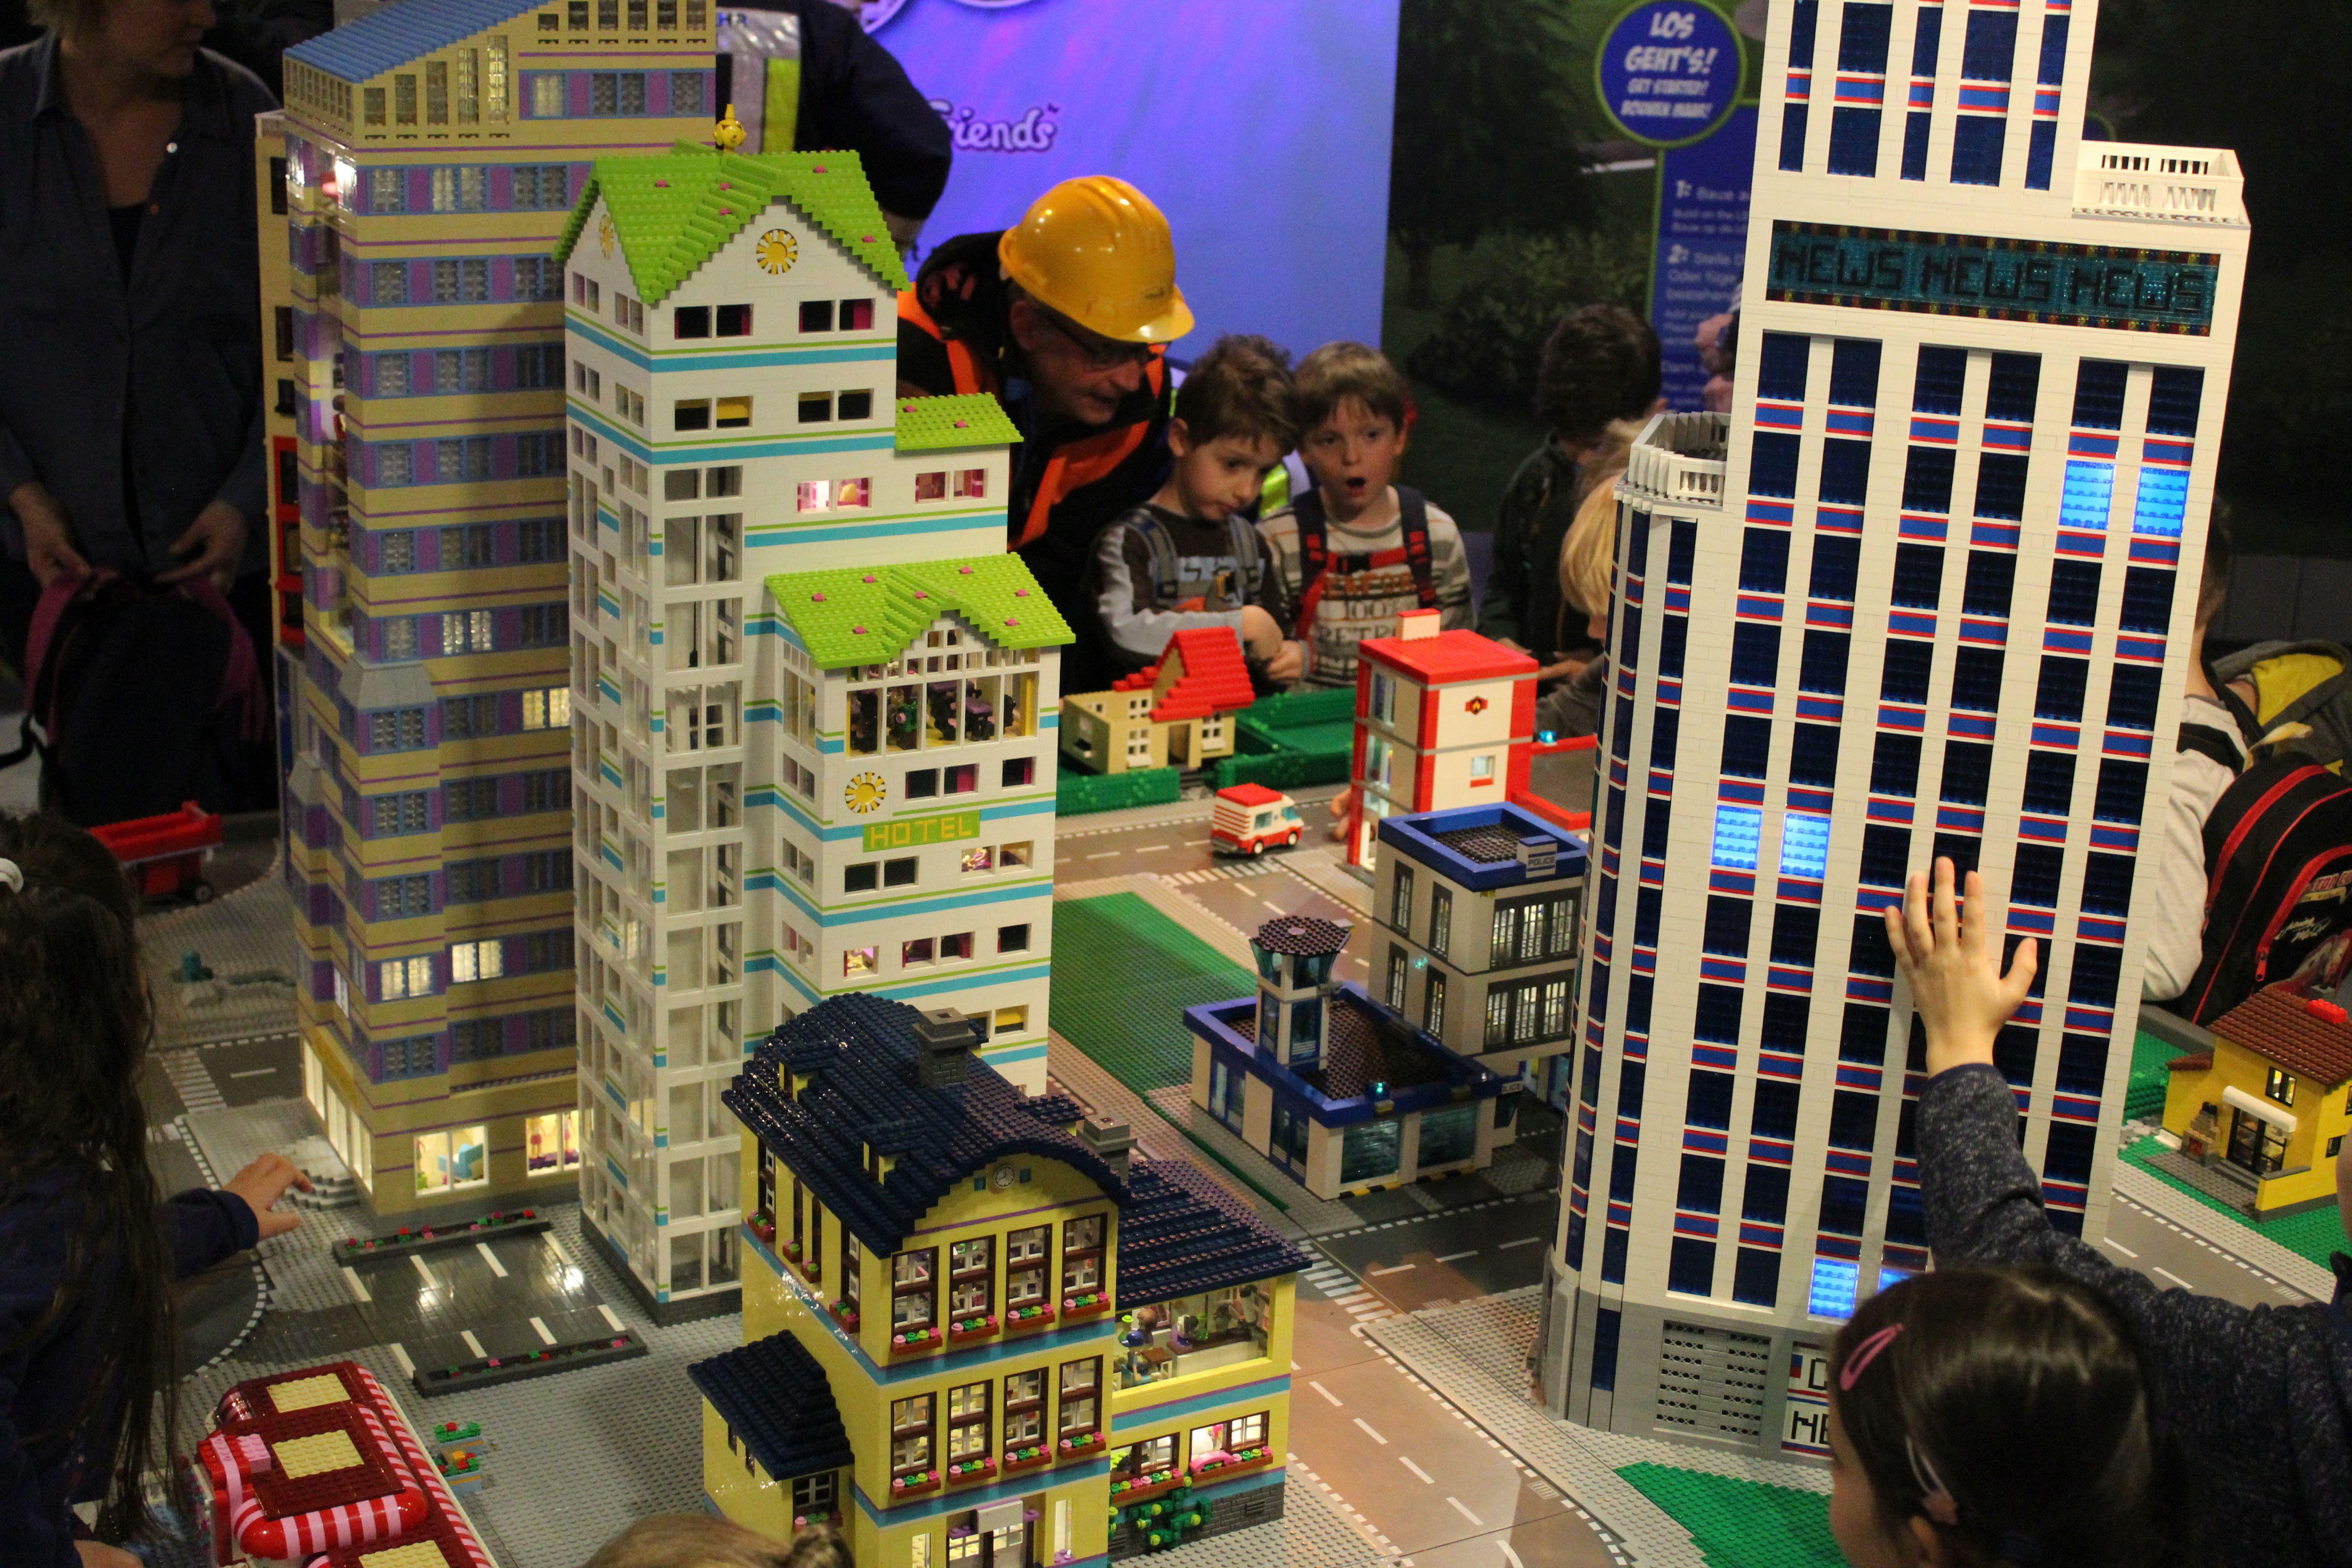 legoland sealife Legoland Discovery Centre